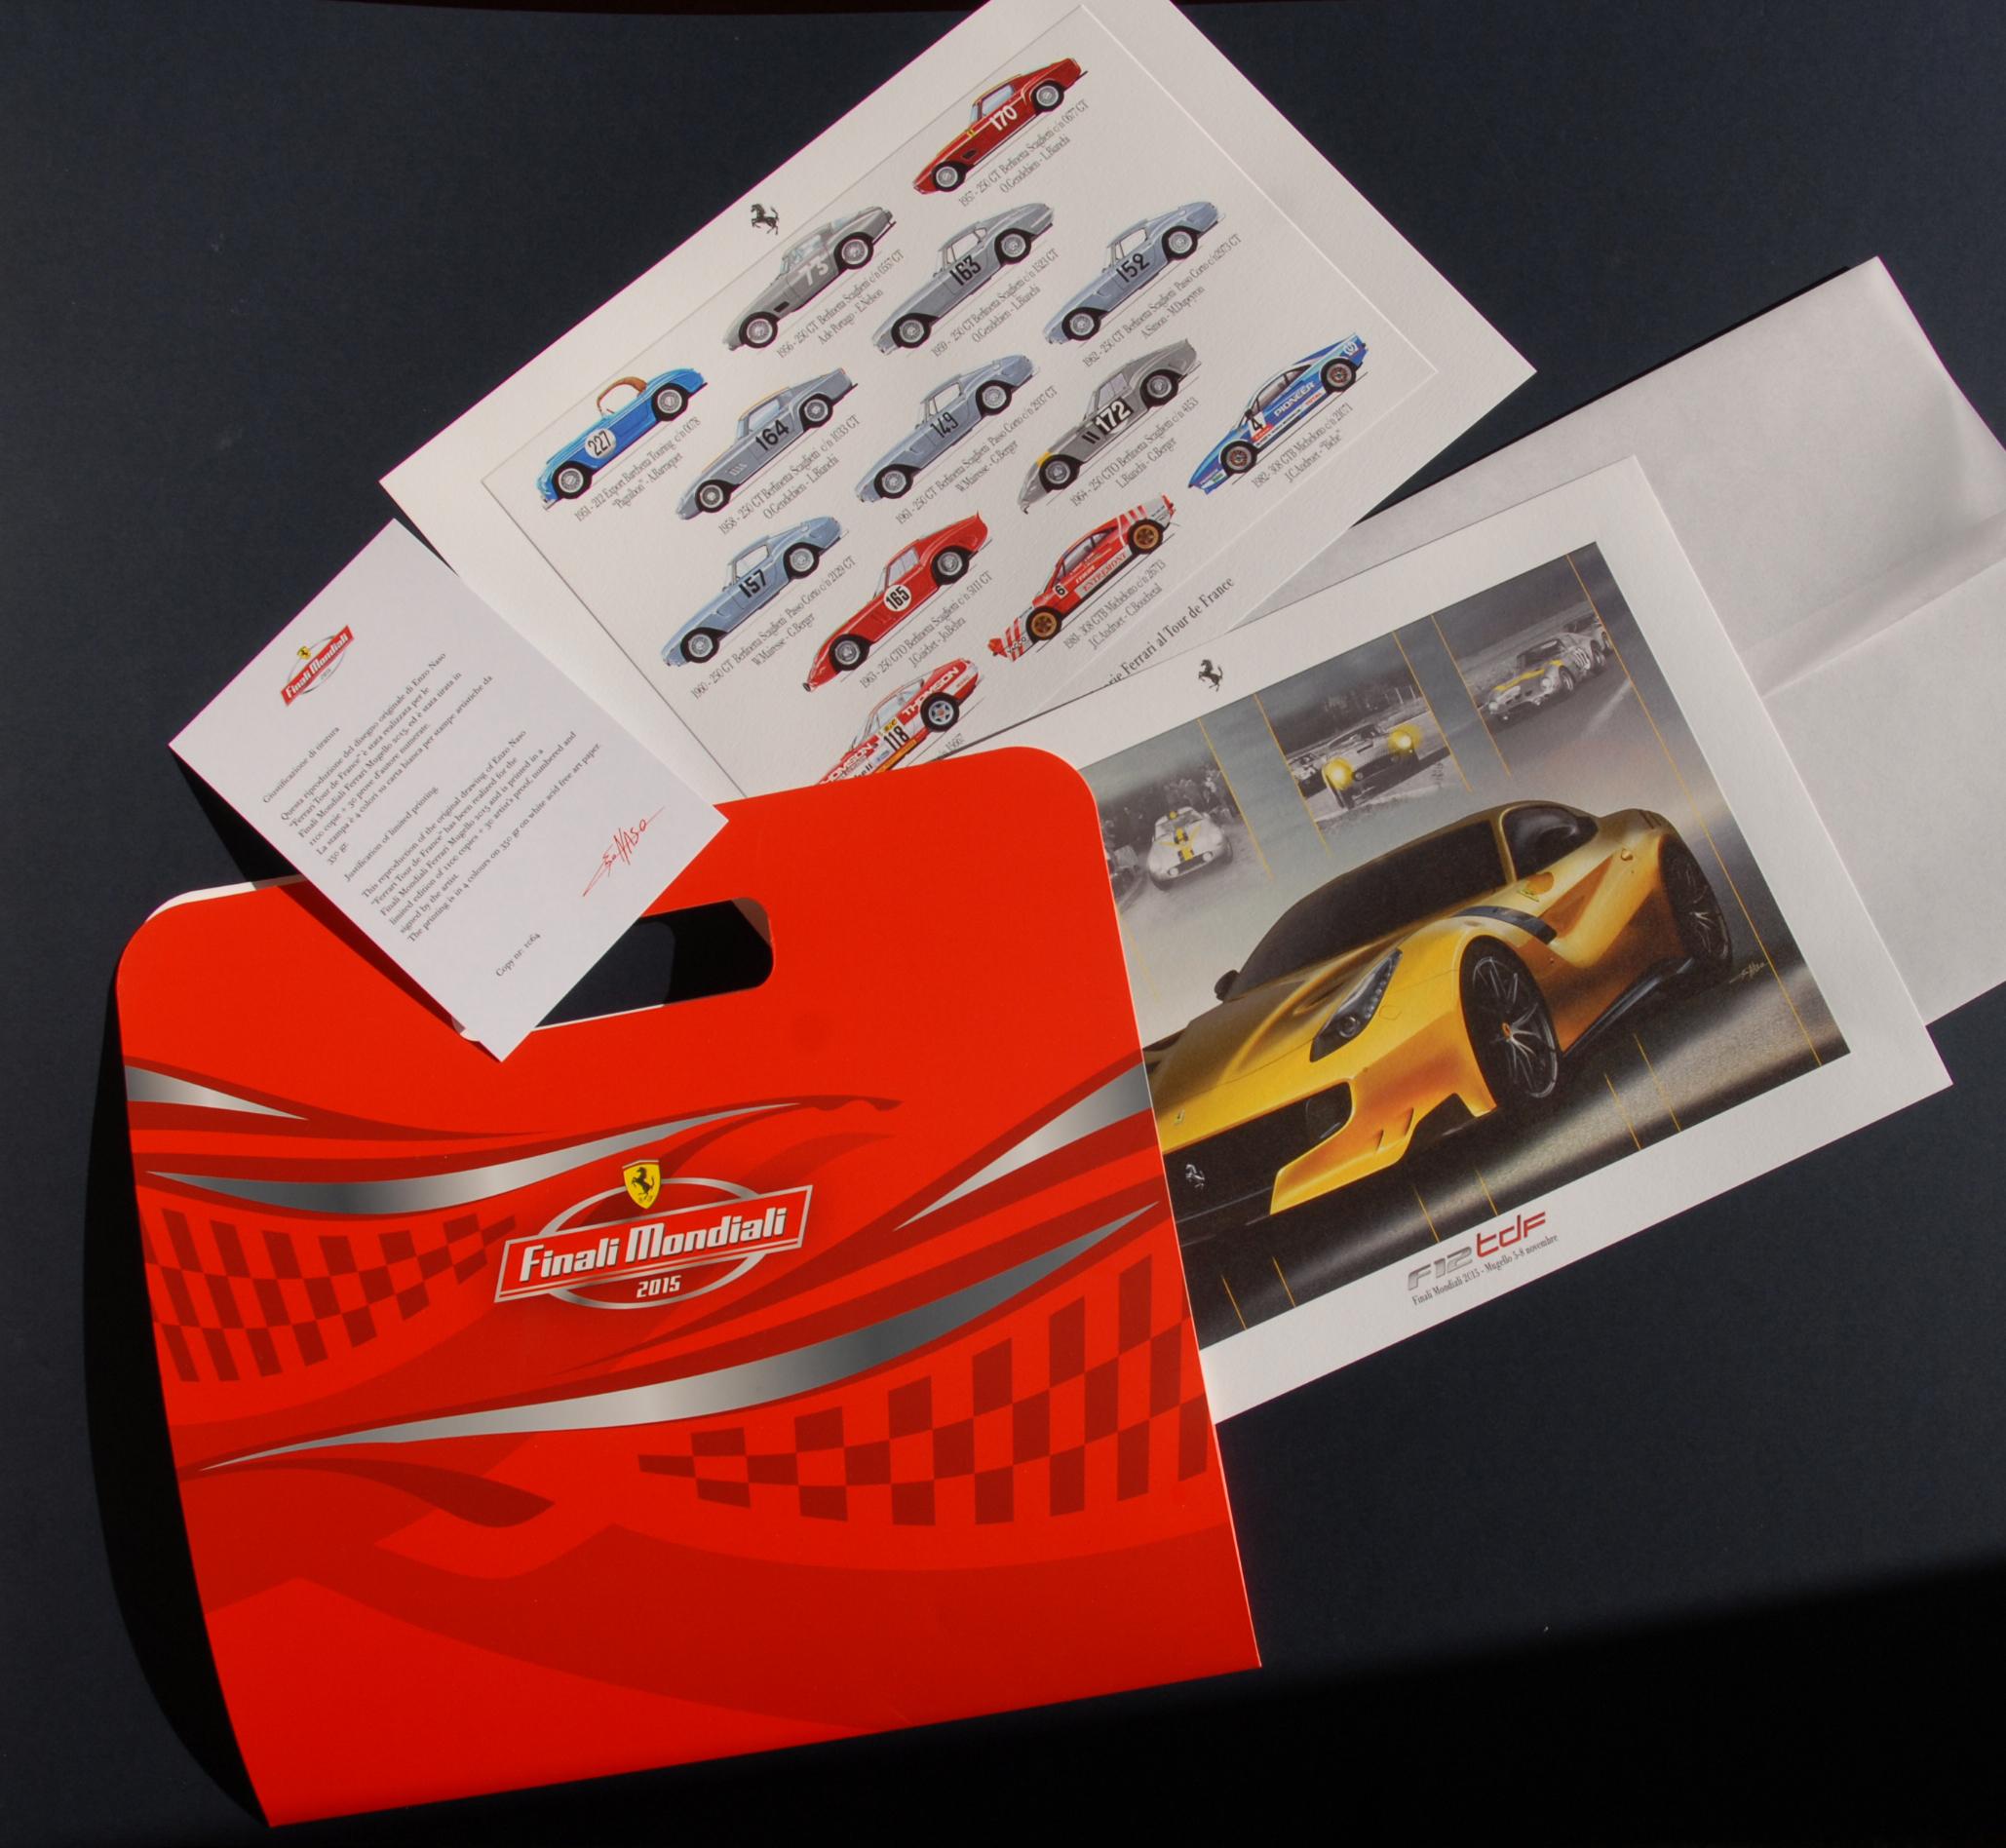 Finali Ferrari 2015